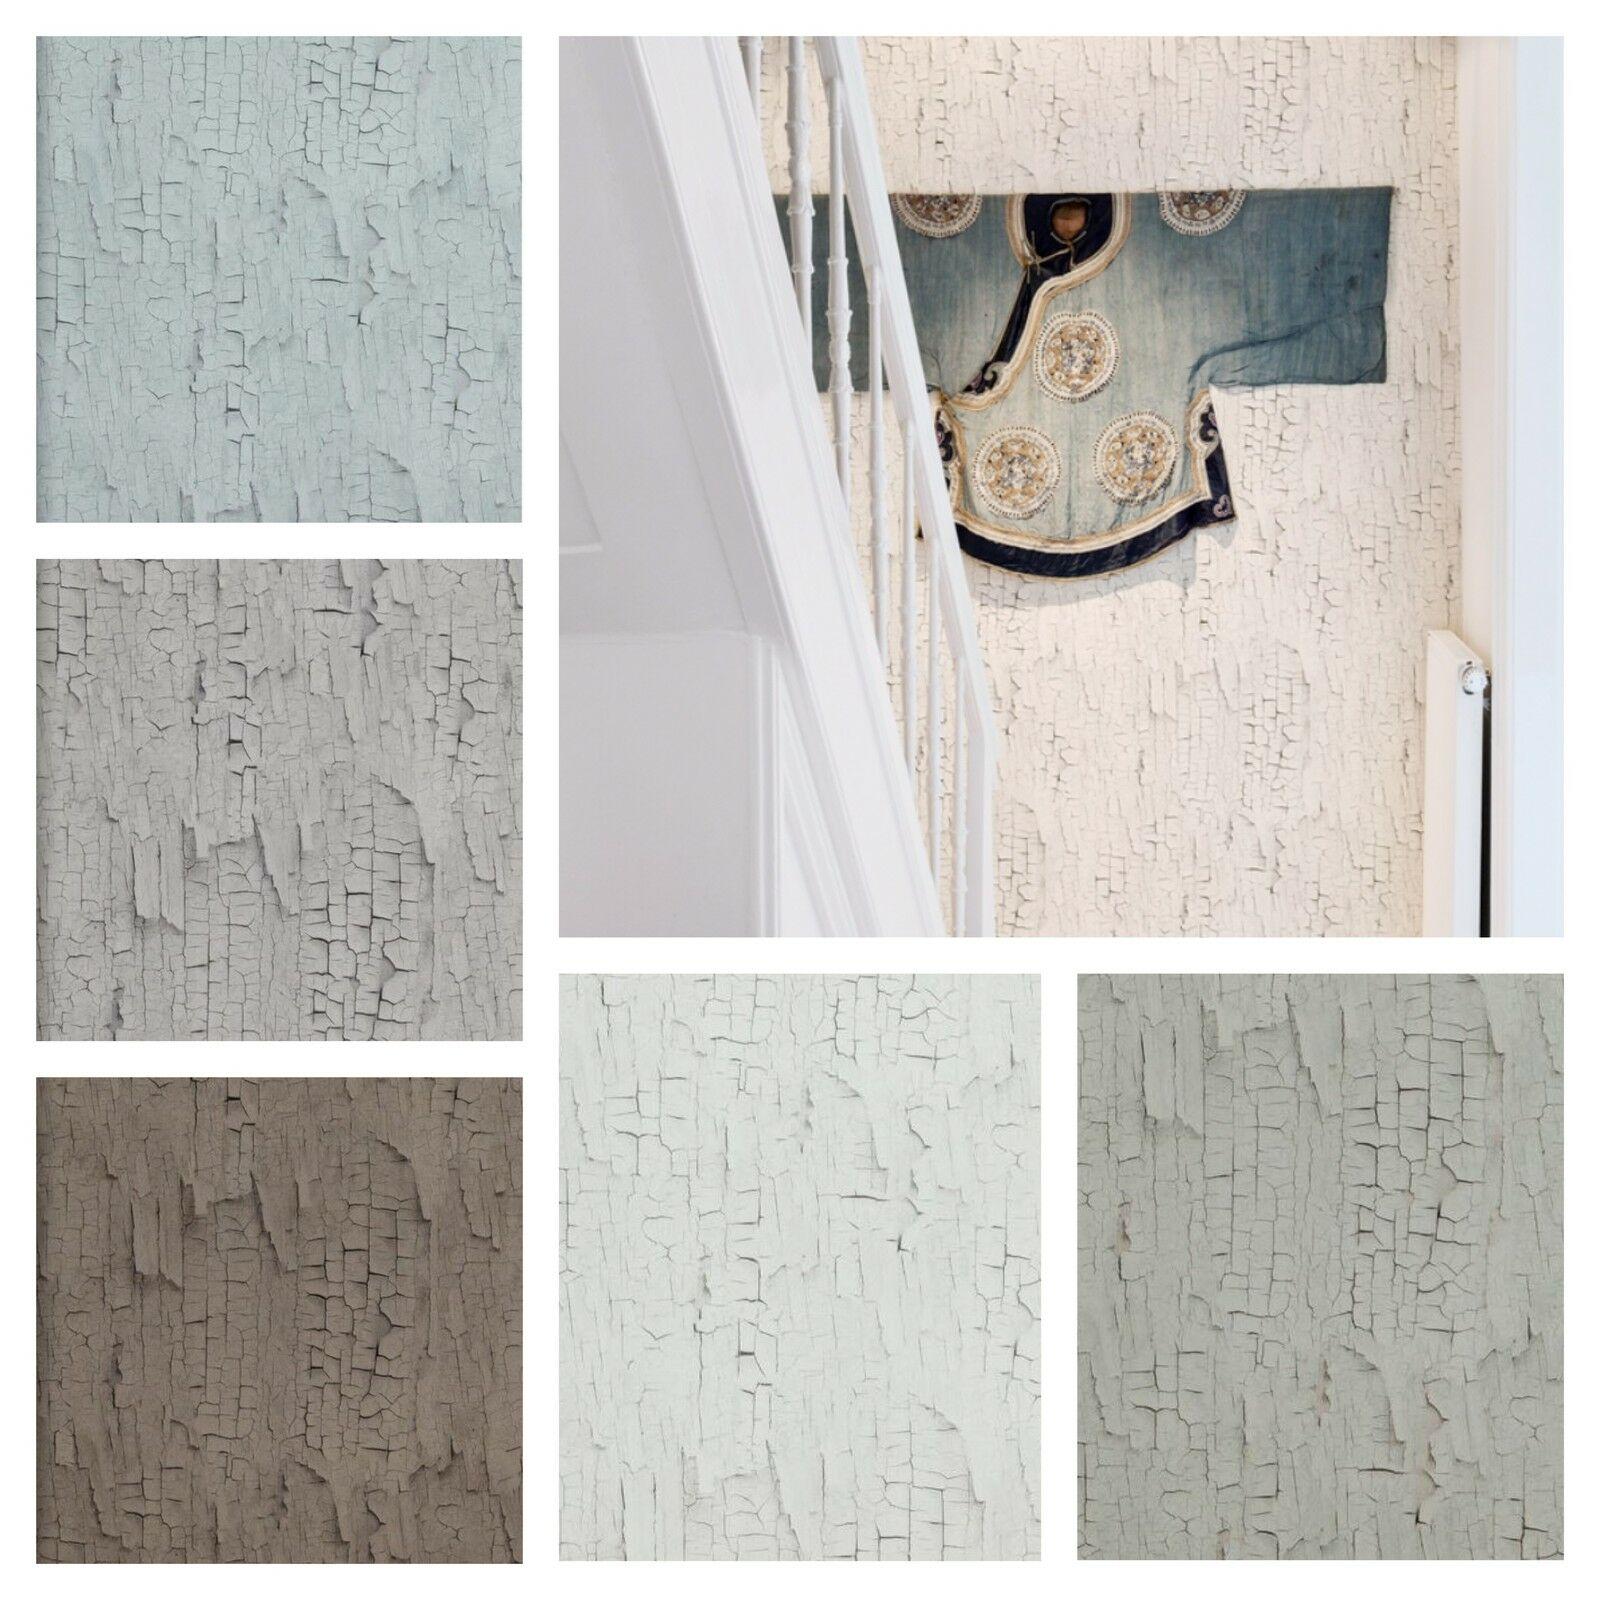 vlies tapete holz rindenmuster creme wei kiesel grau taupe braun pastell blau kaufen bei. Black Bedroom Furniture Sets. Home Design Ideas